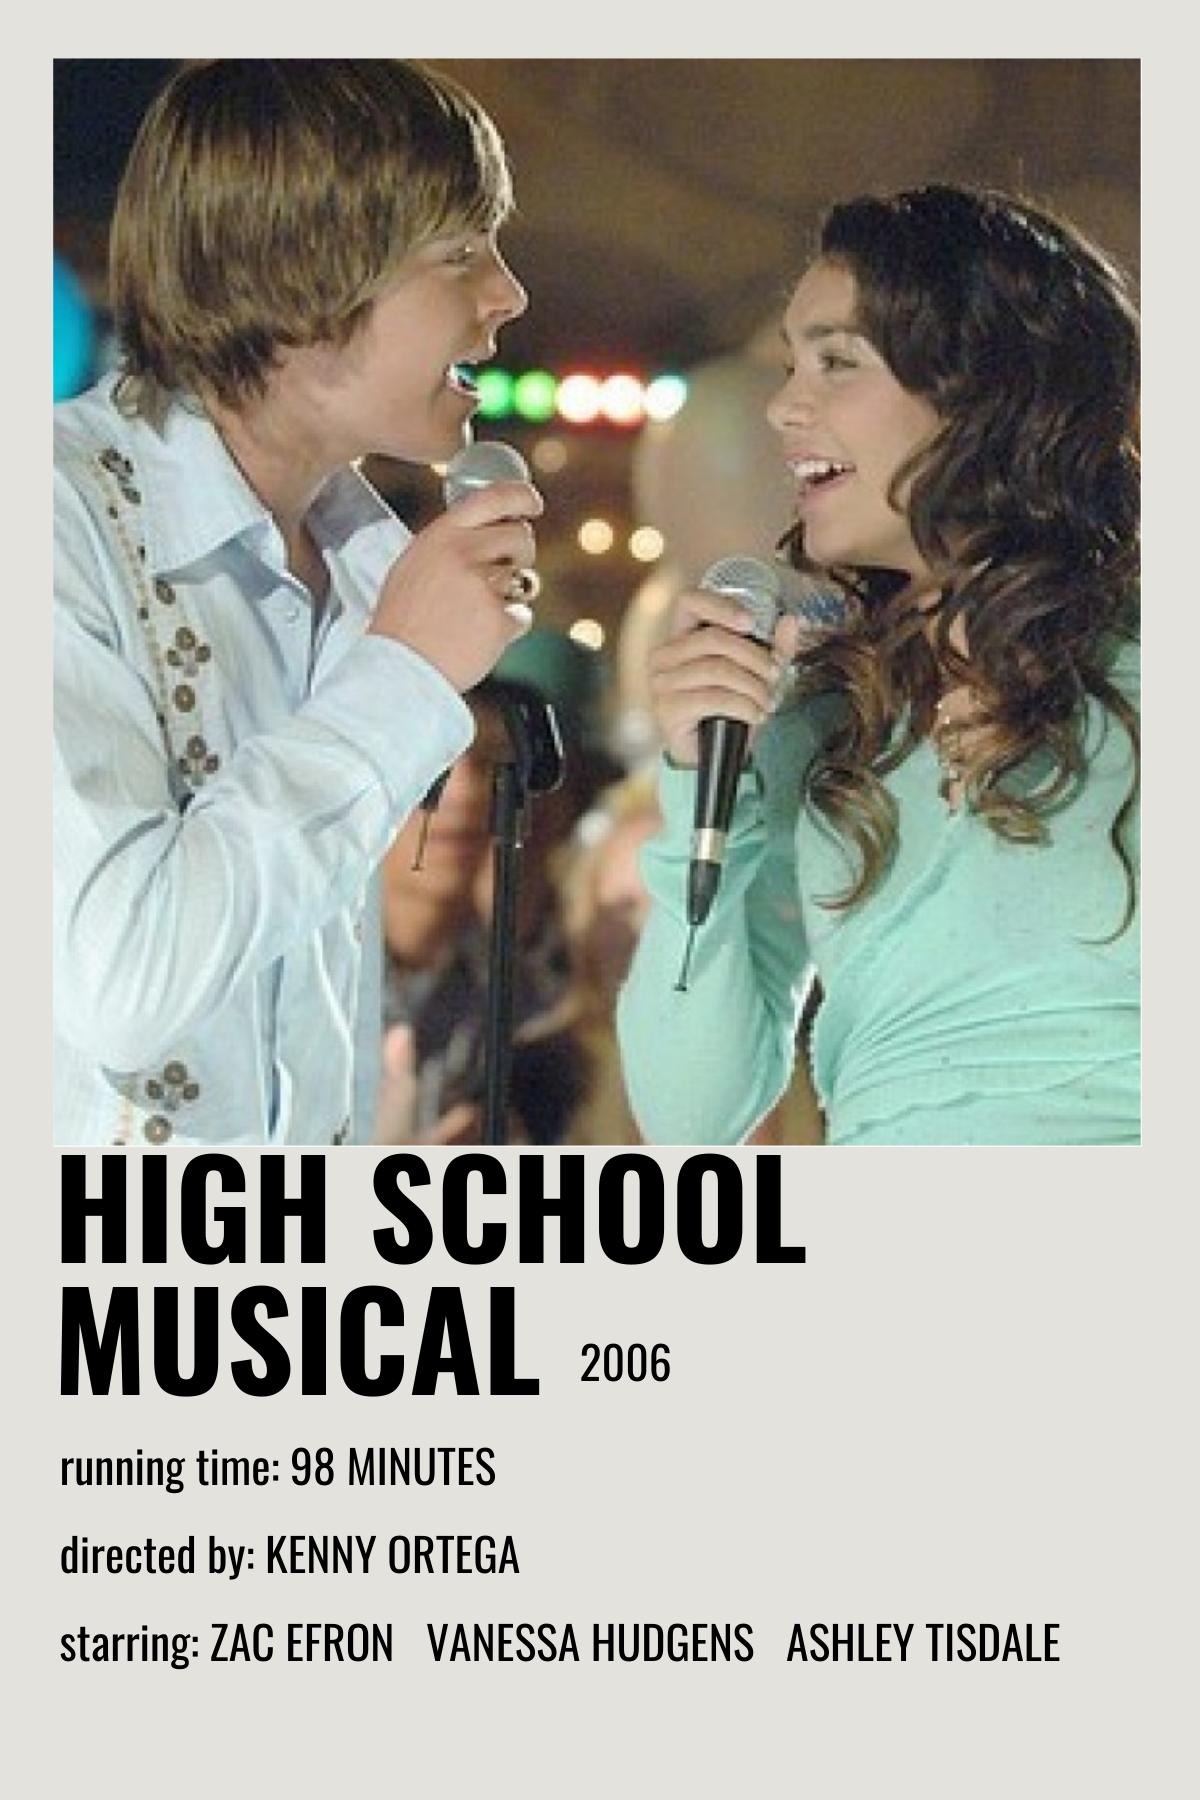 high school musical movie poster